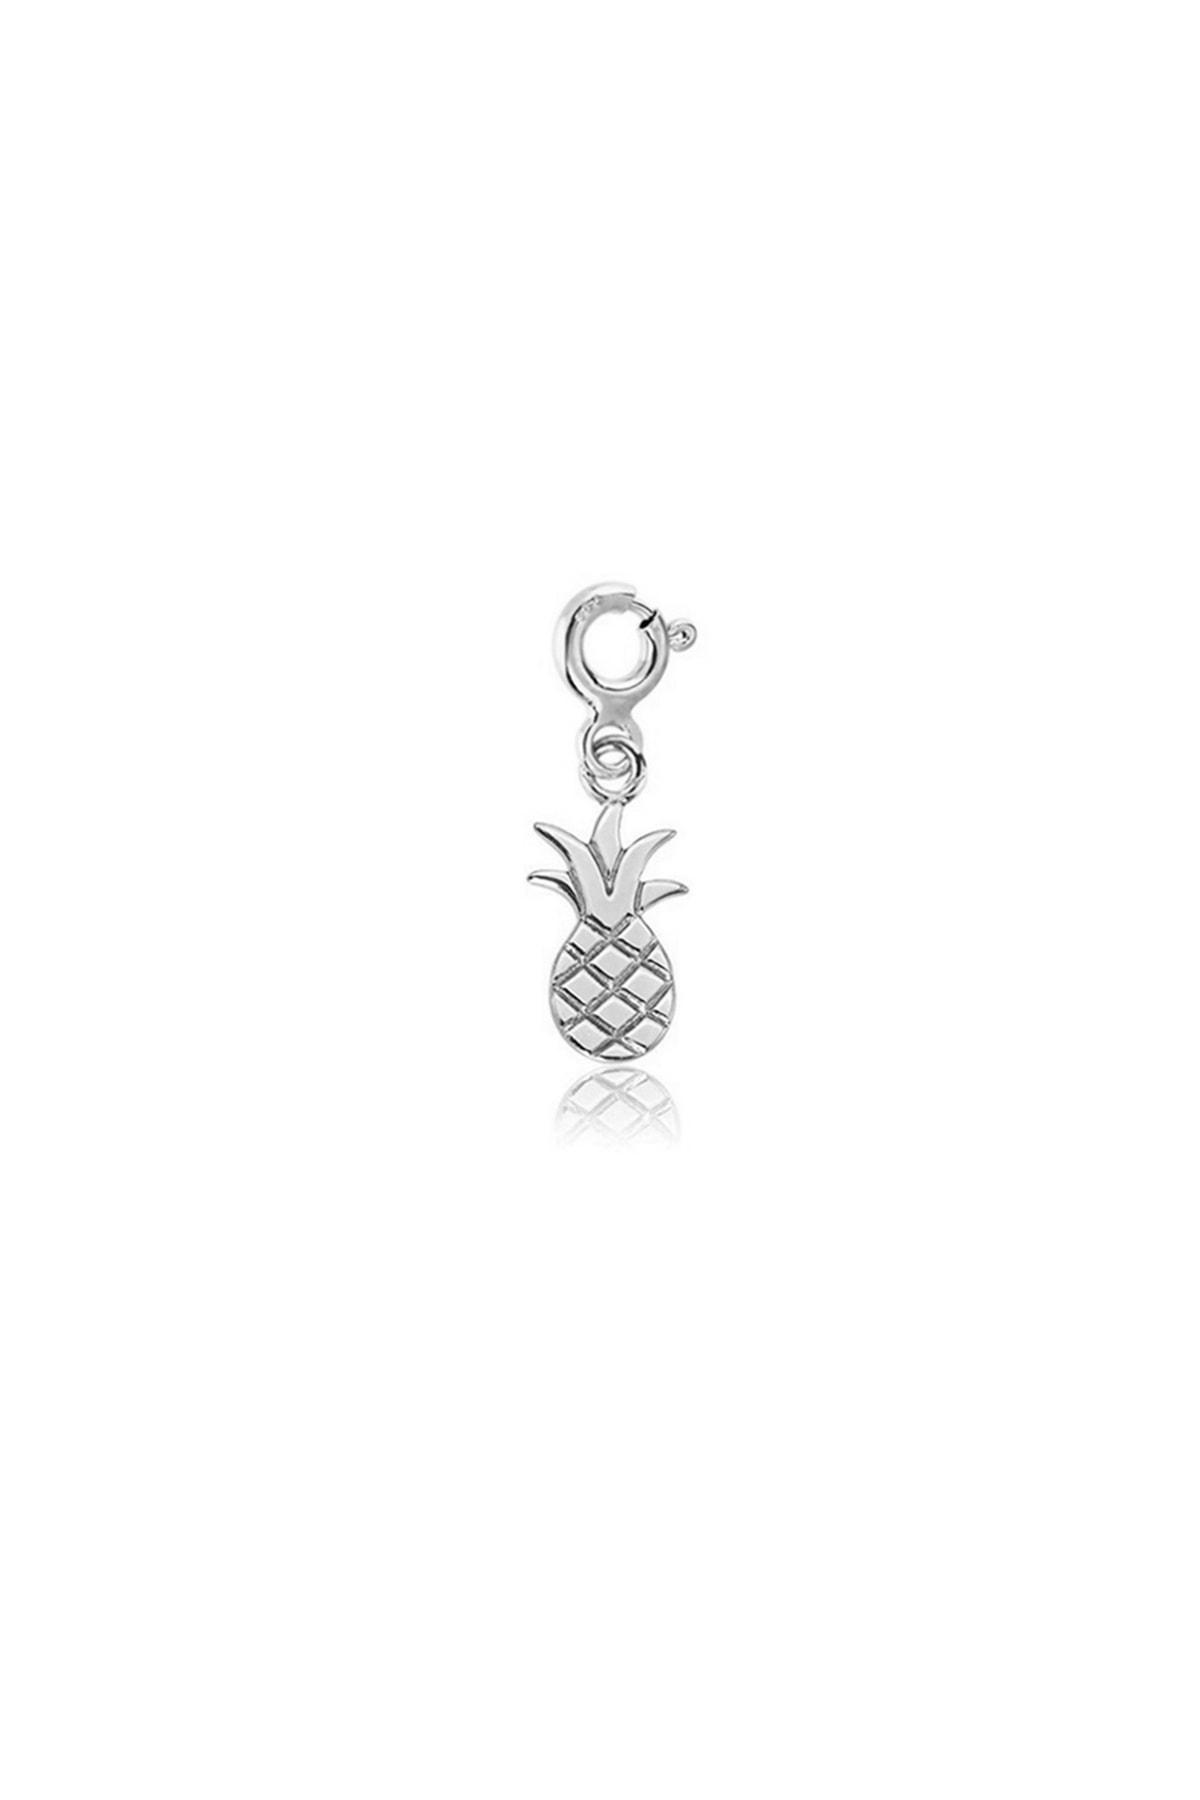 Femmevien 925 Ayar Gümüş Ananas Charm